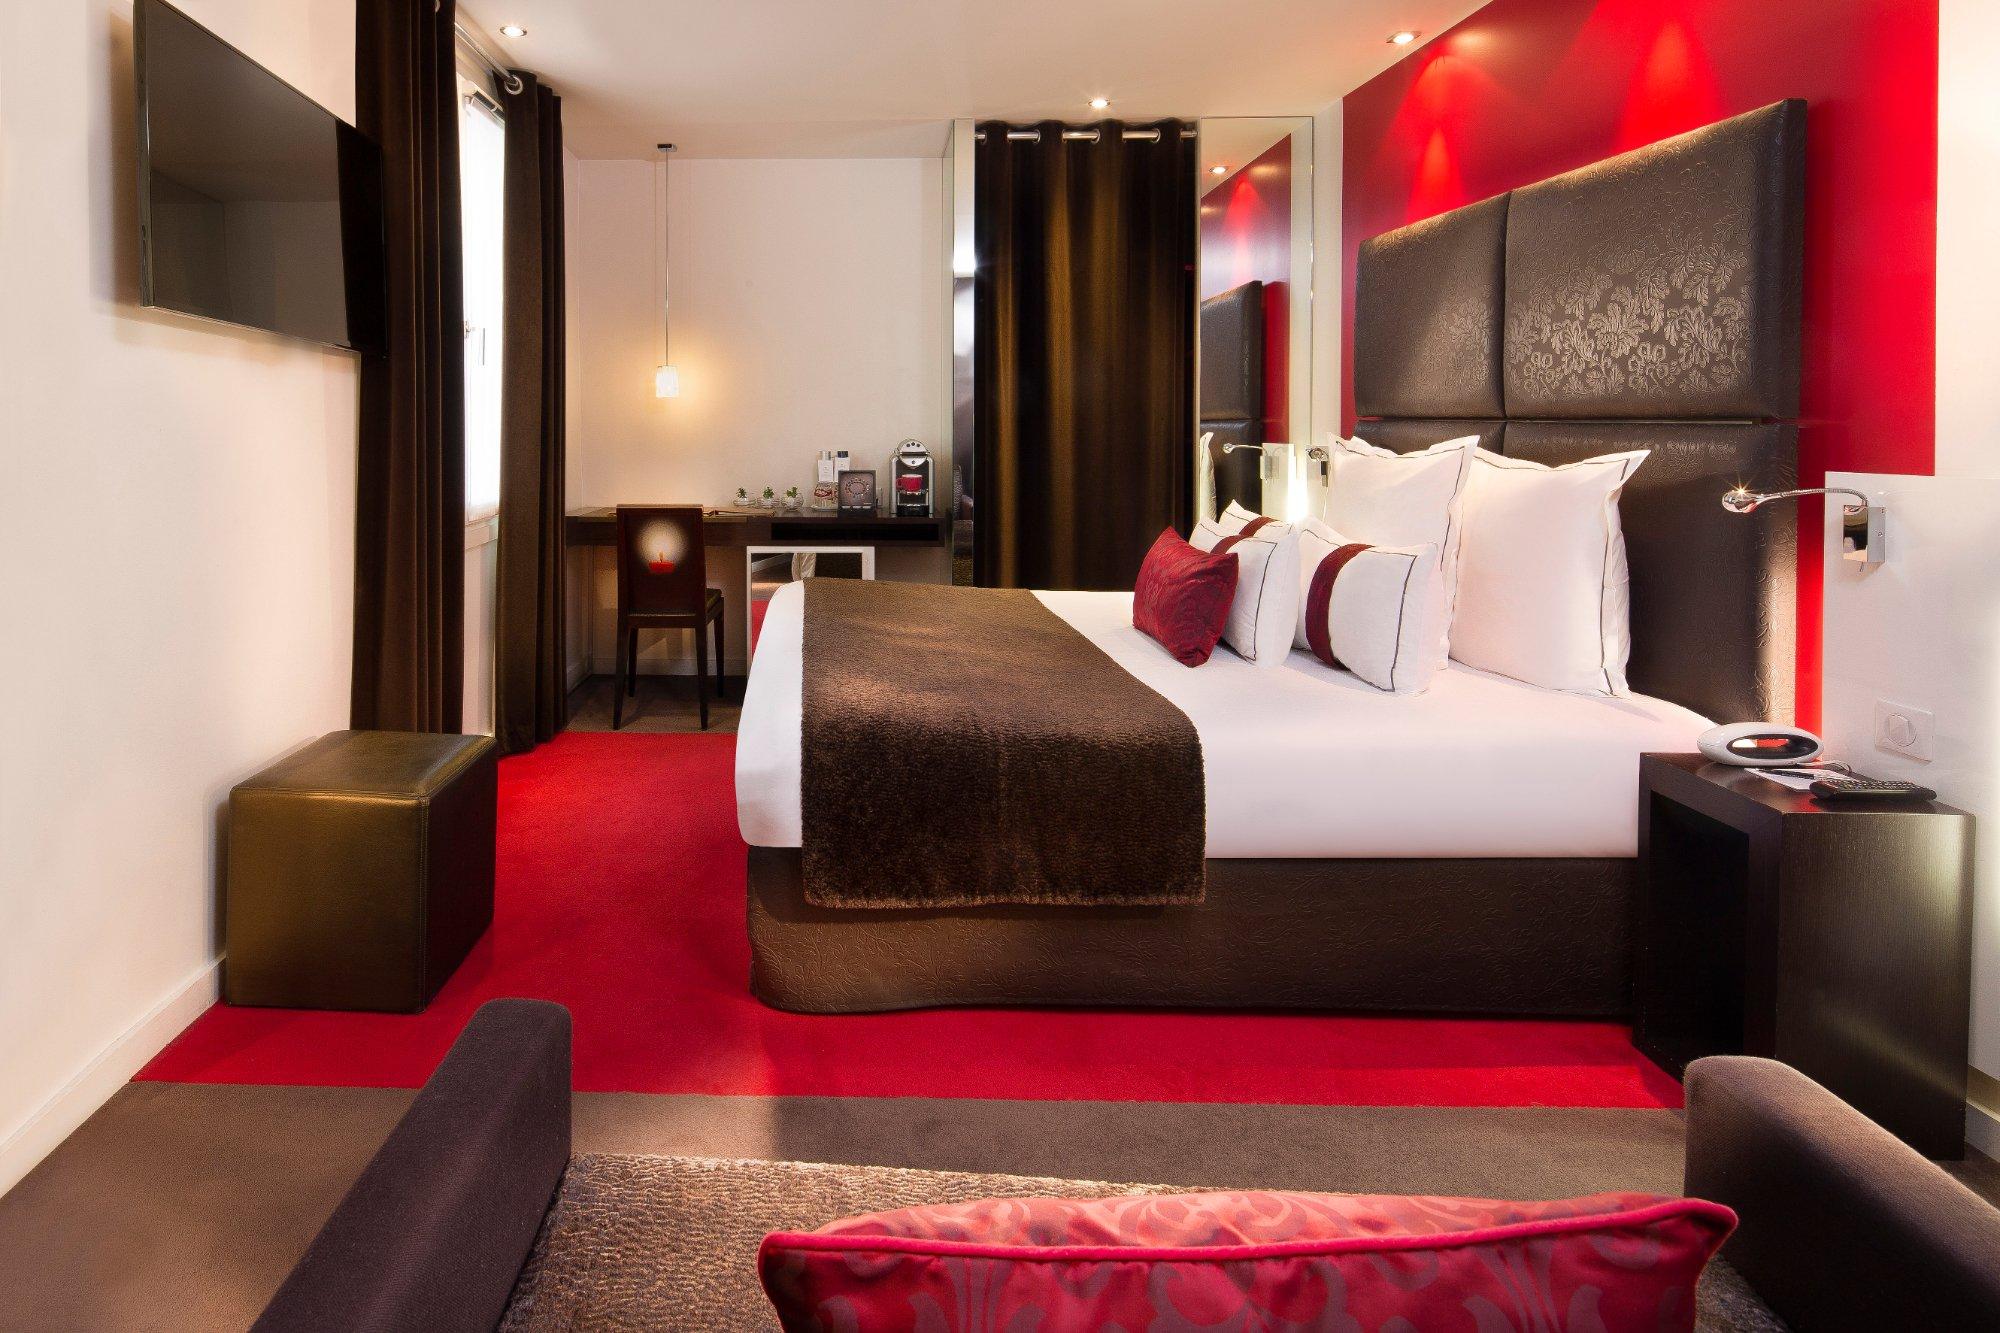 Grand Hotel Saint-Michel